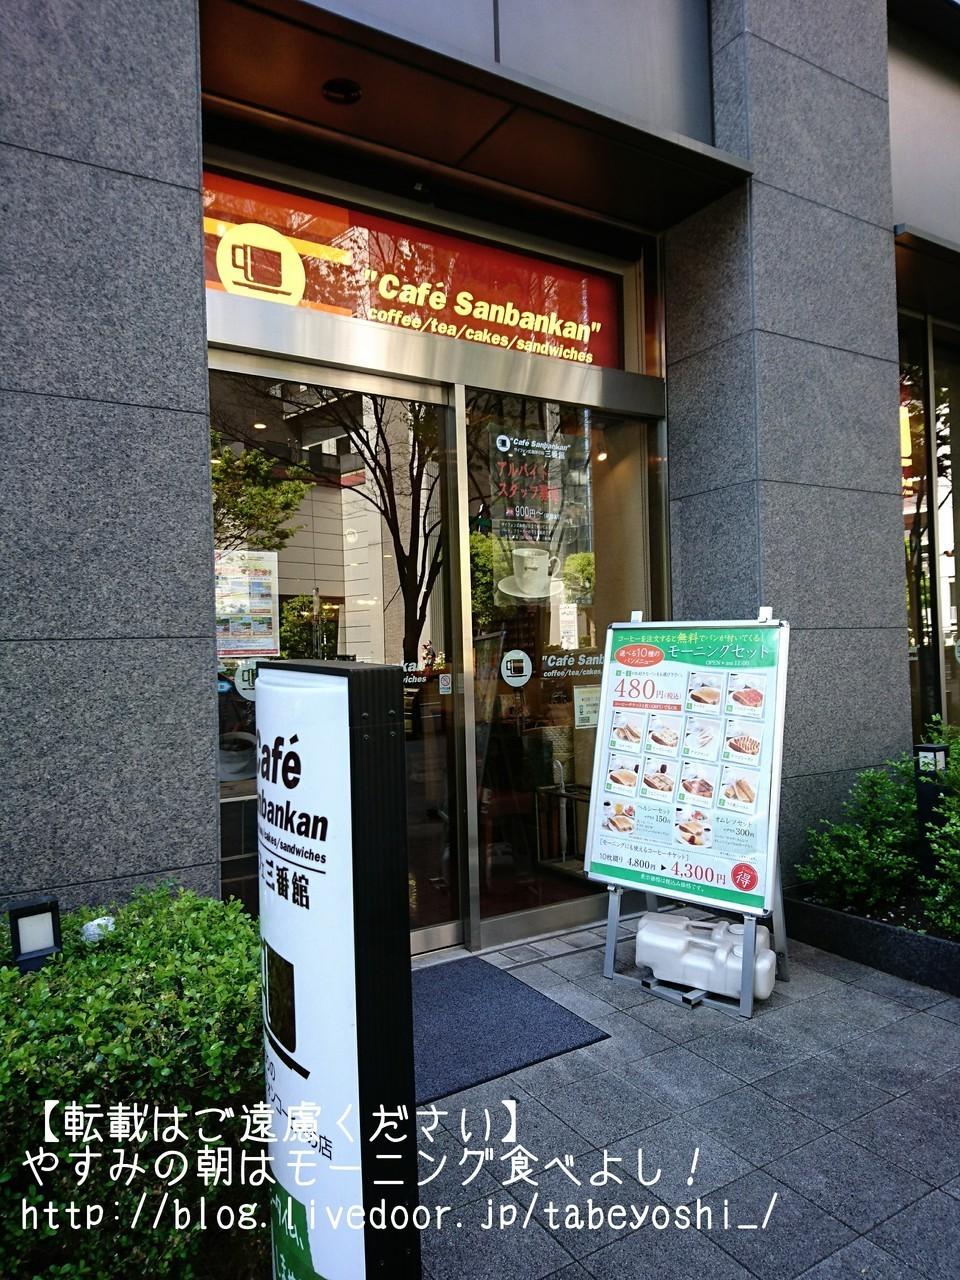 Café Sanbankan